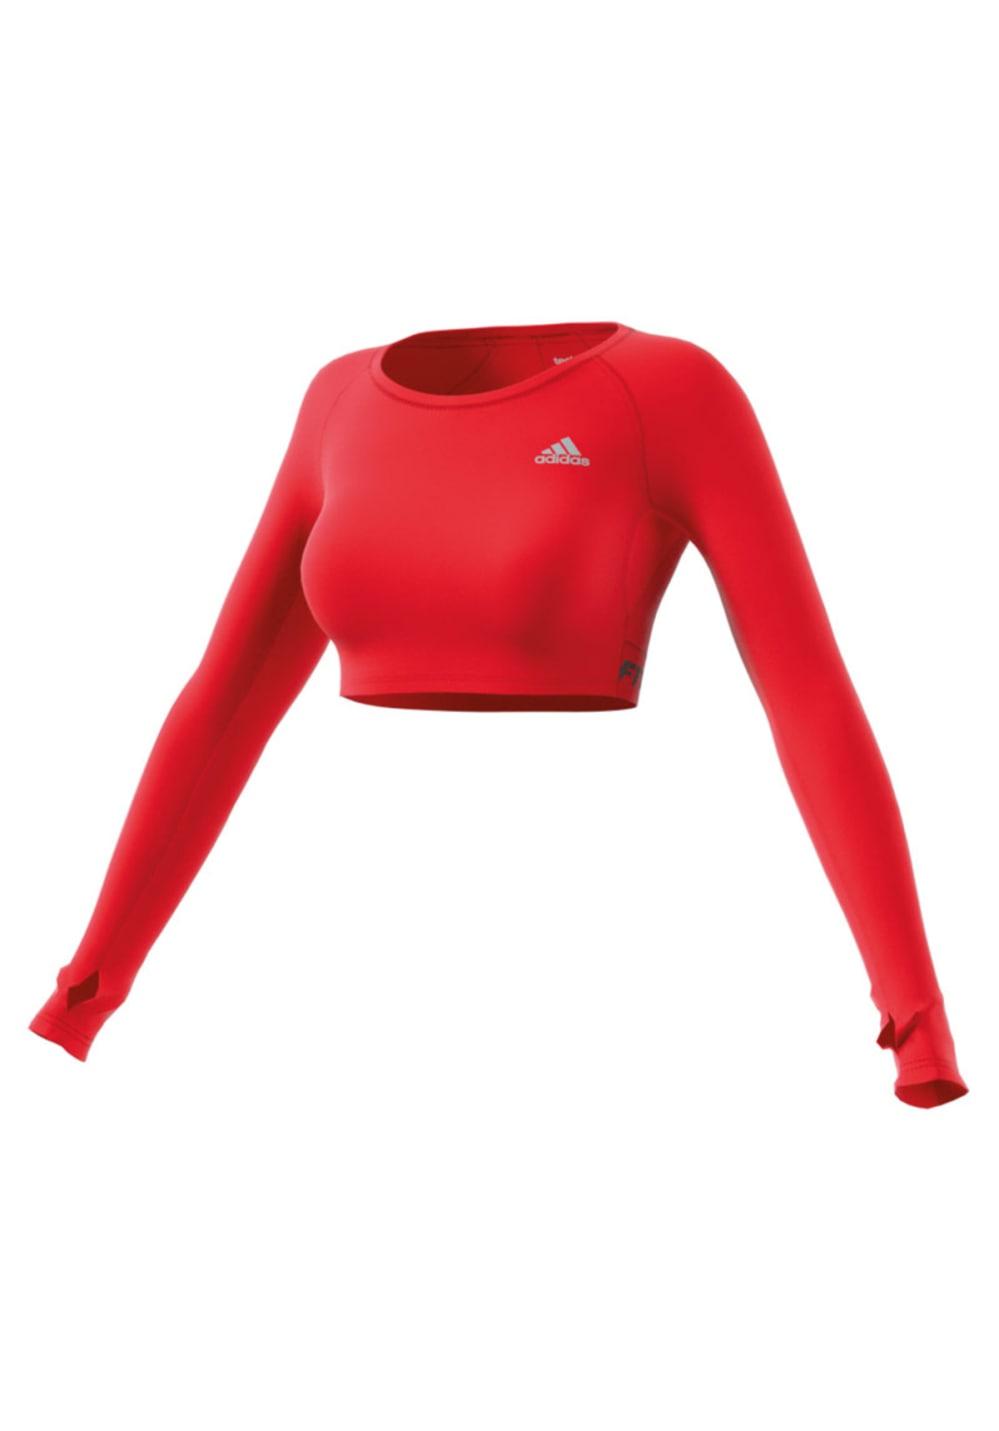 4dfc5b8f679e2 adidas Tf Crop Top - Running tops for Women - Red